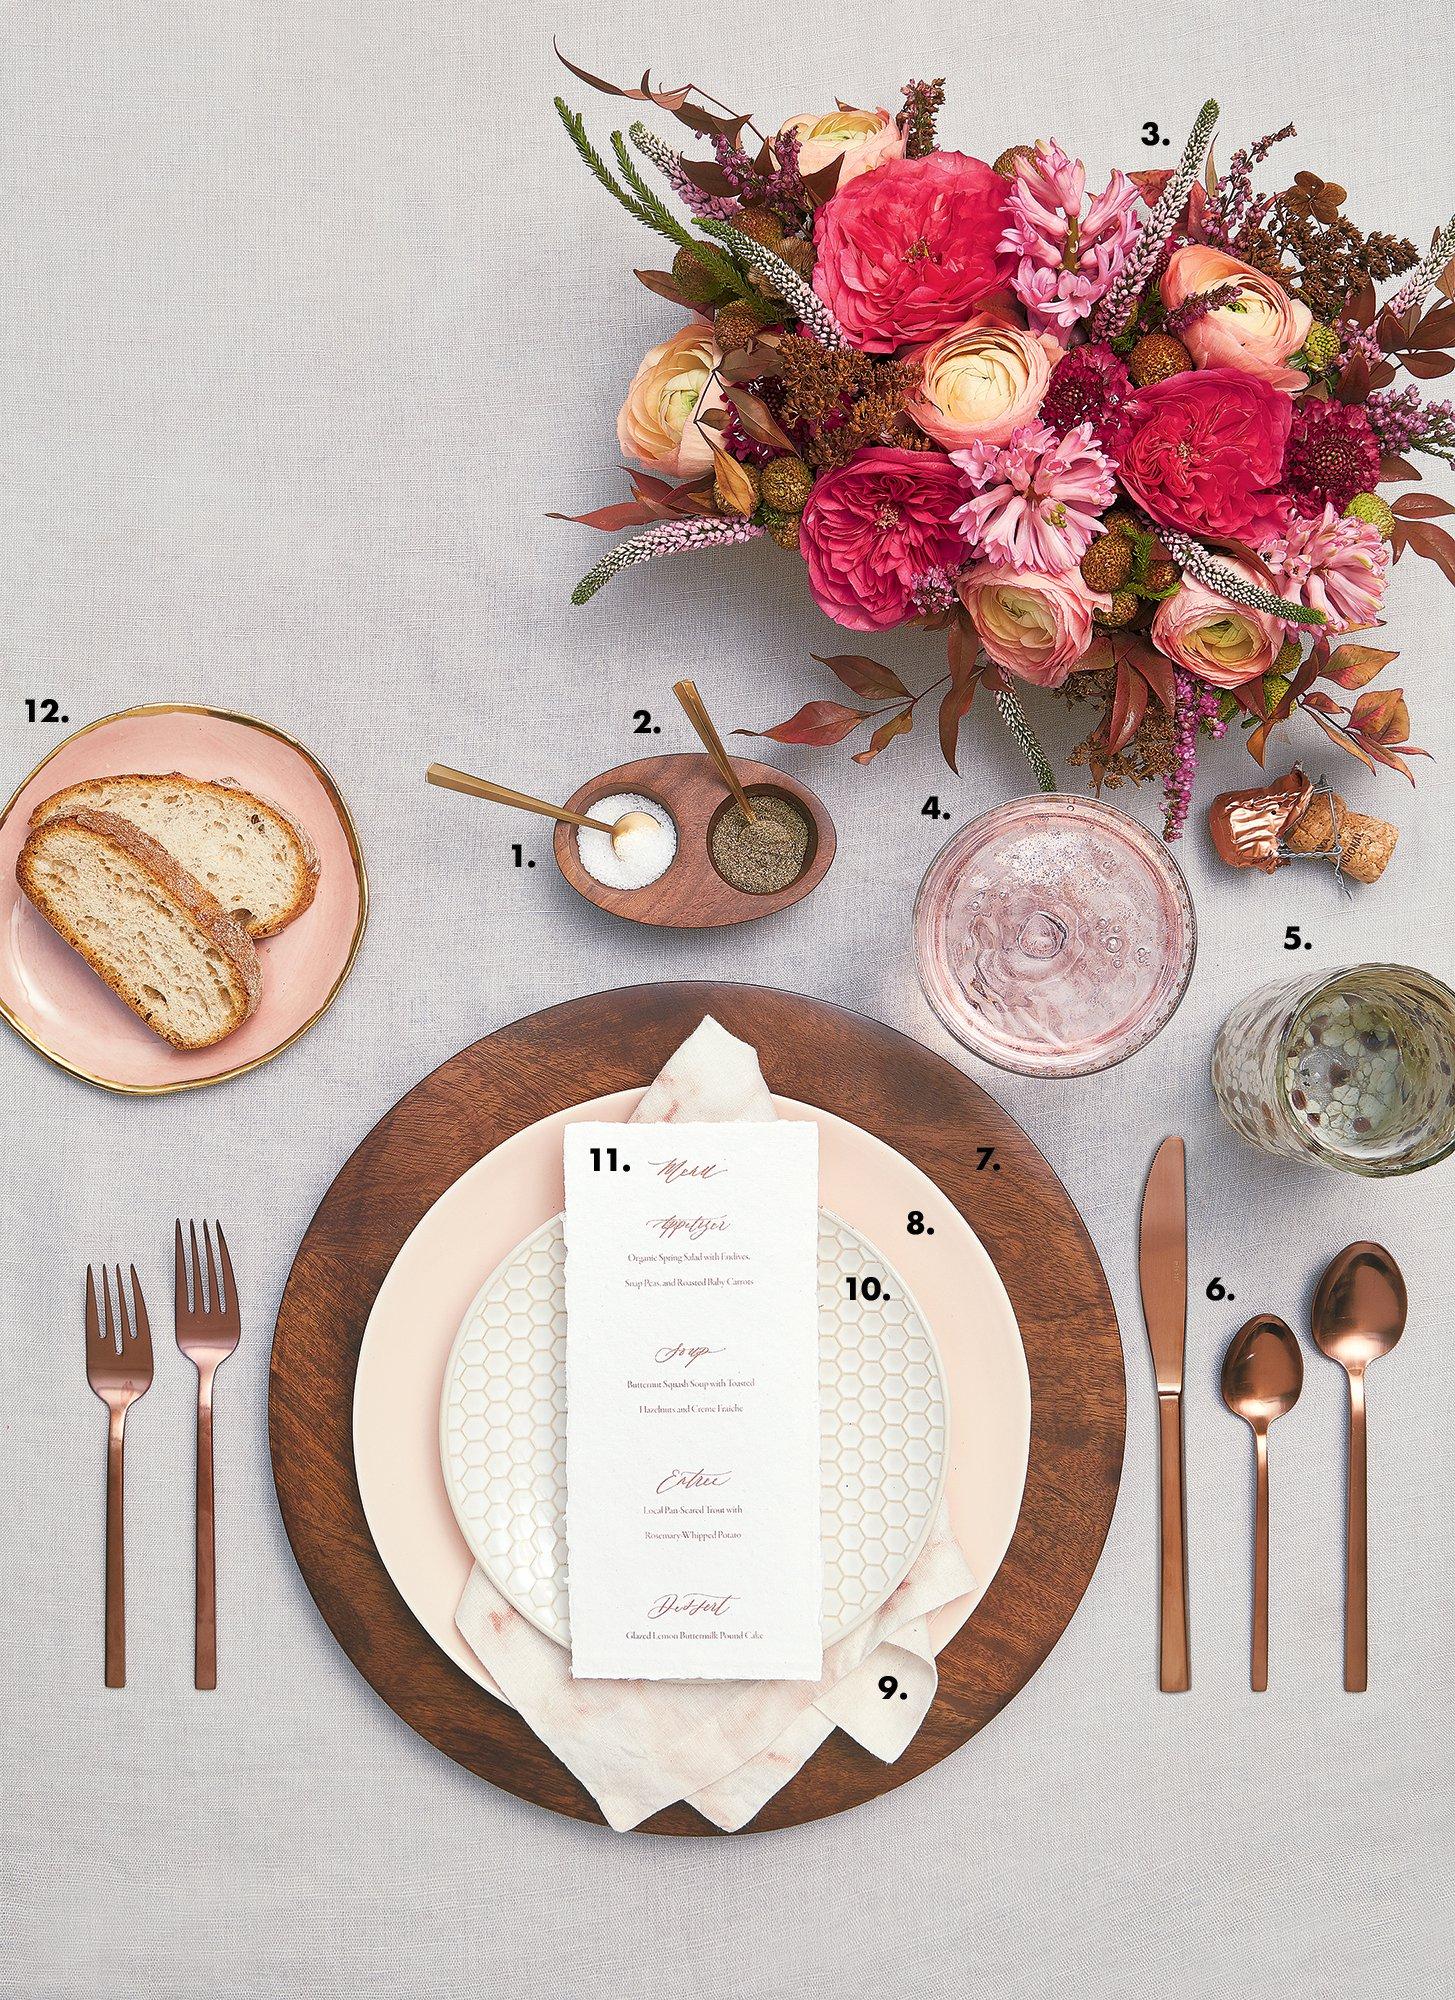 Two ways to set a table | Washingtonian Magazine